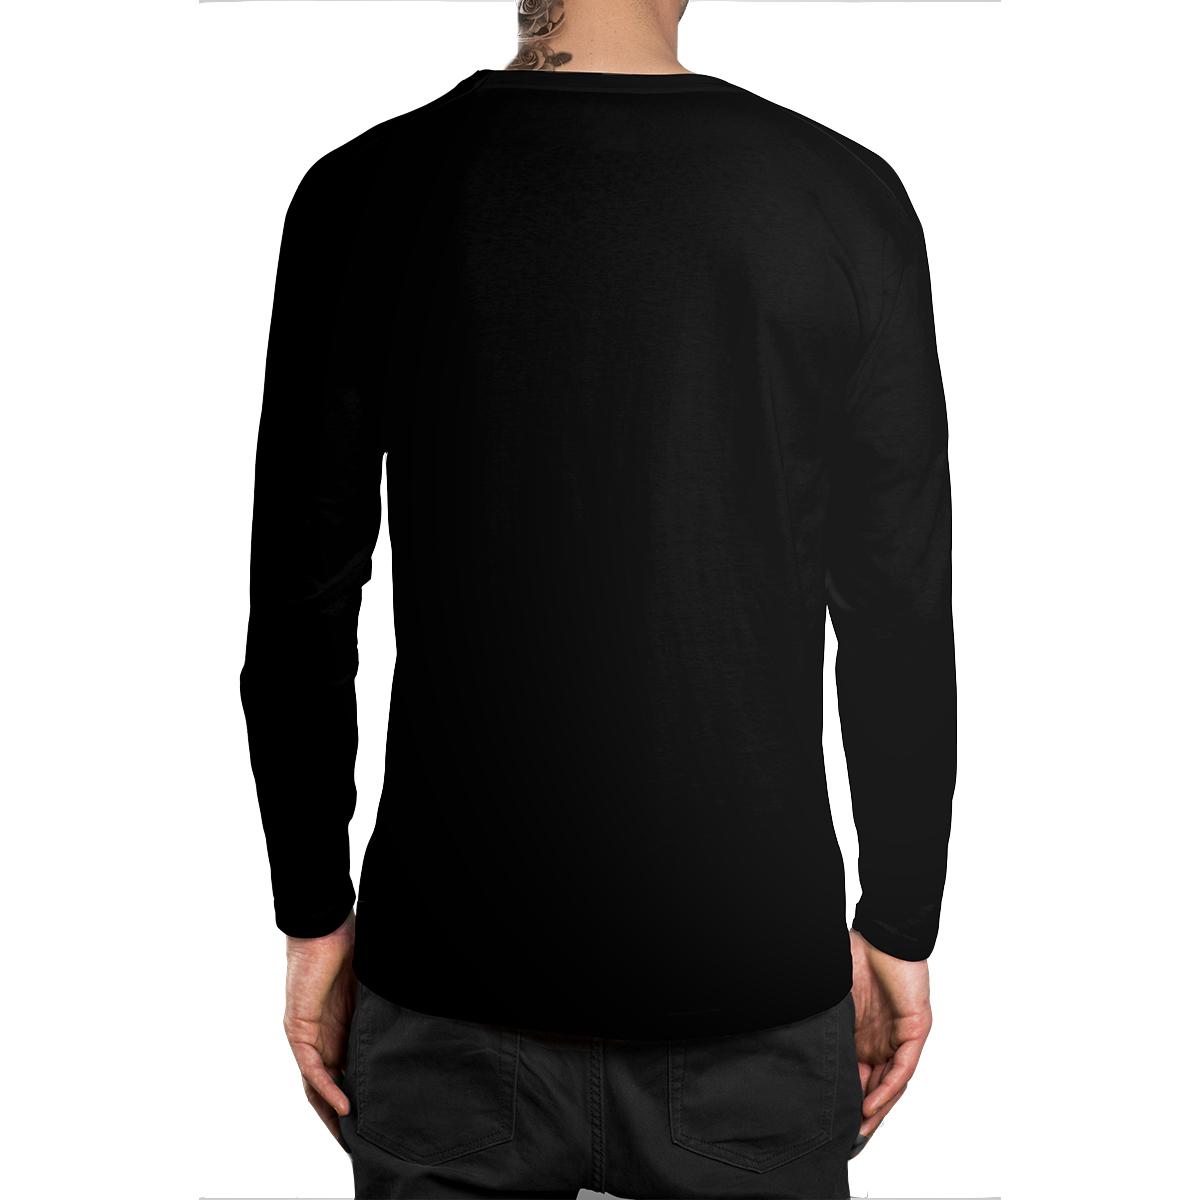 Stompy Camiseta Manga Longa Modelo 24